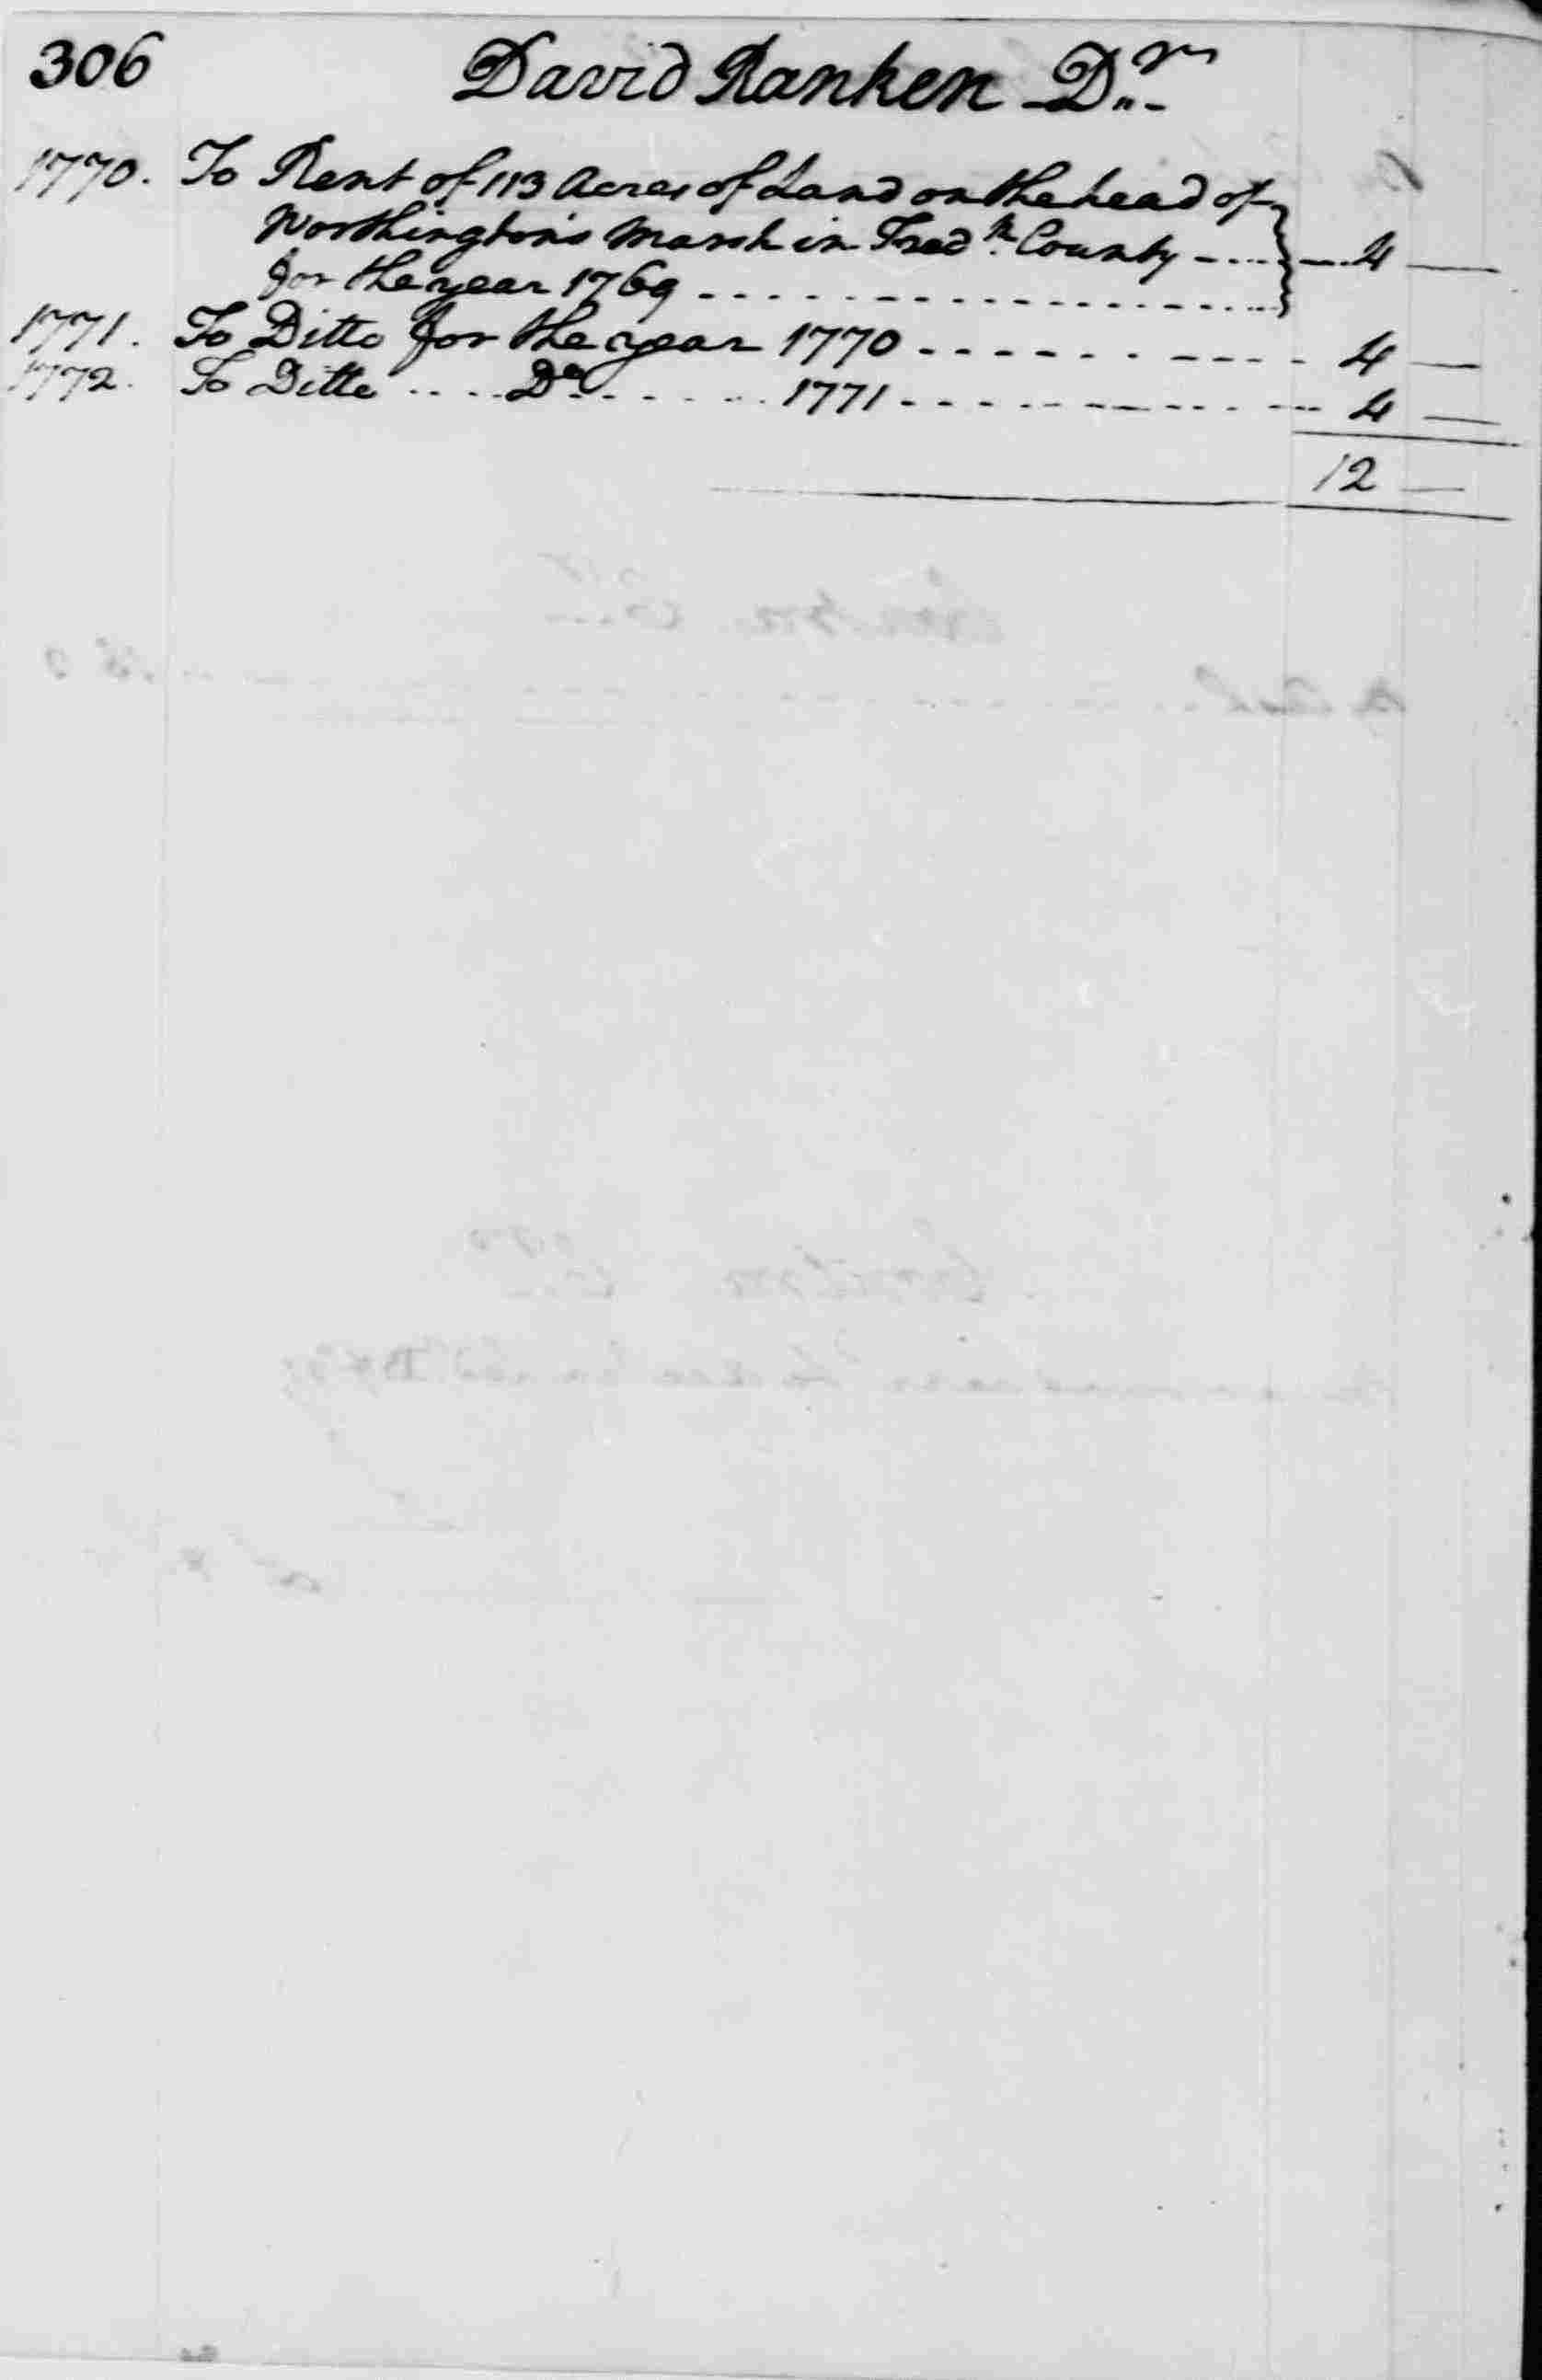 Ledger A, folio 306, left side